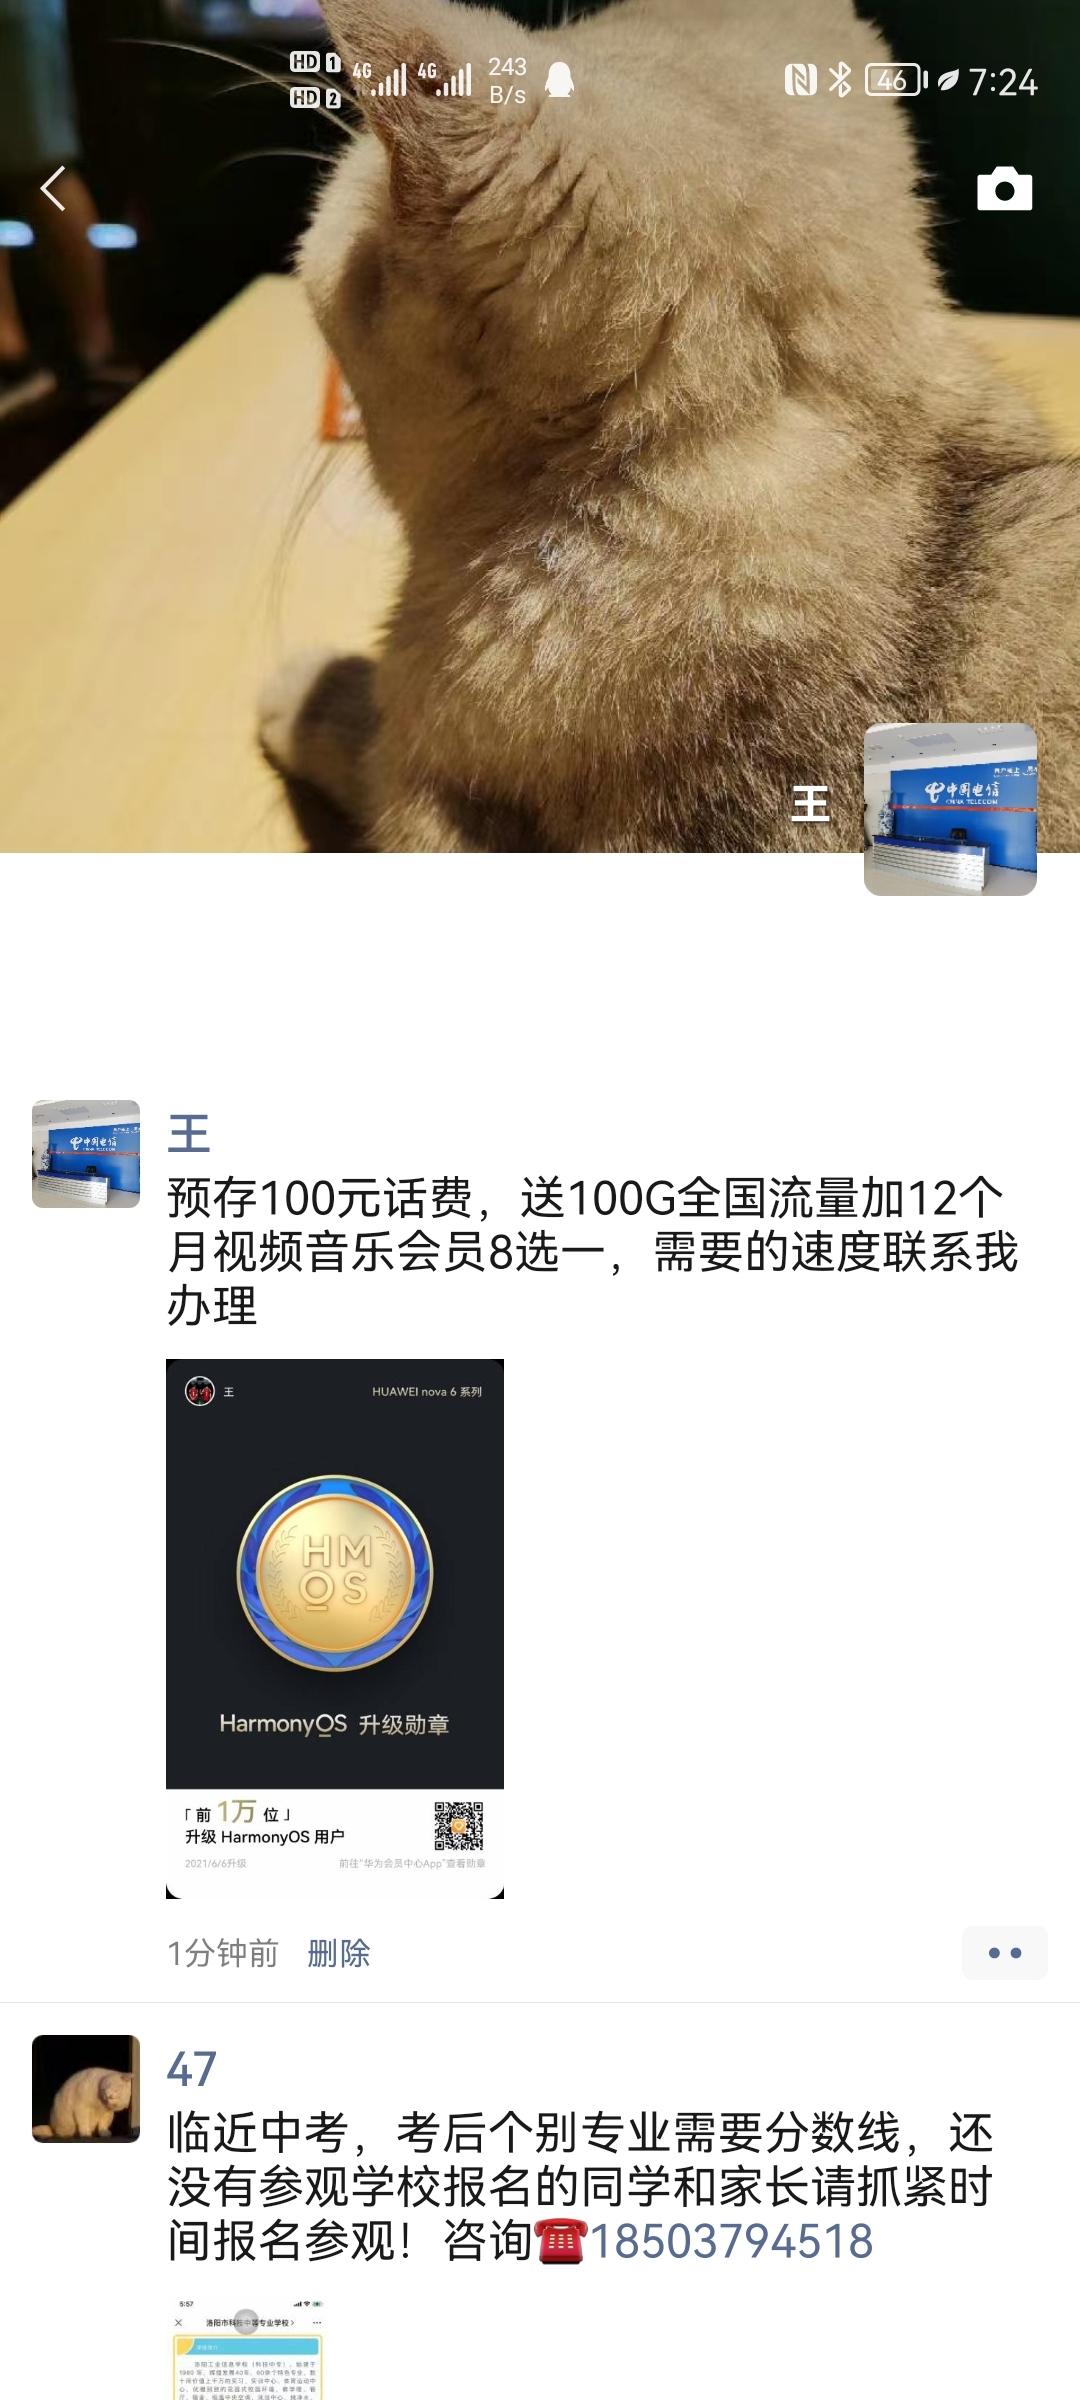 Screenshot_20210618_192436_com.tencent.mm.jpg